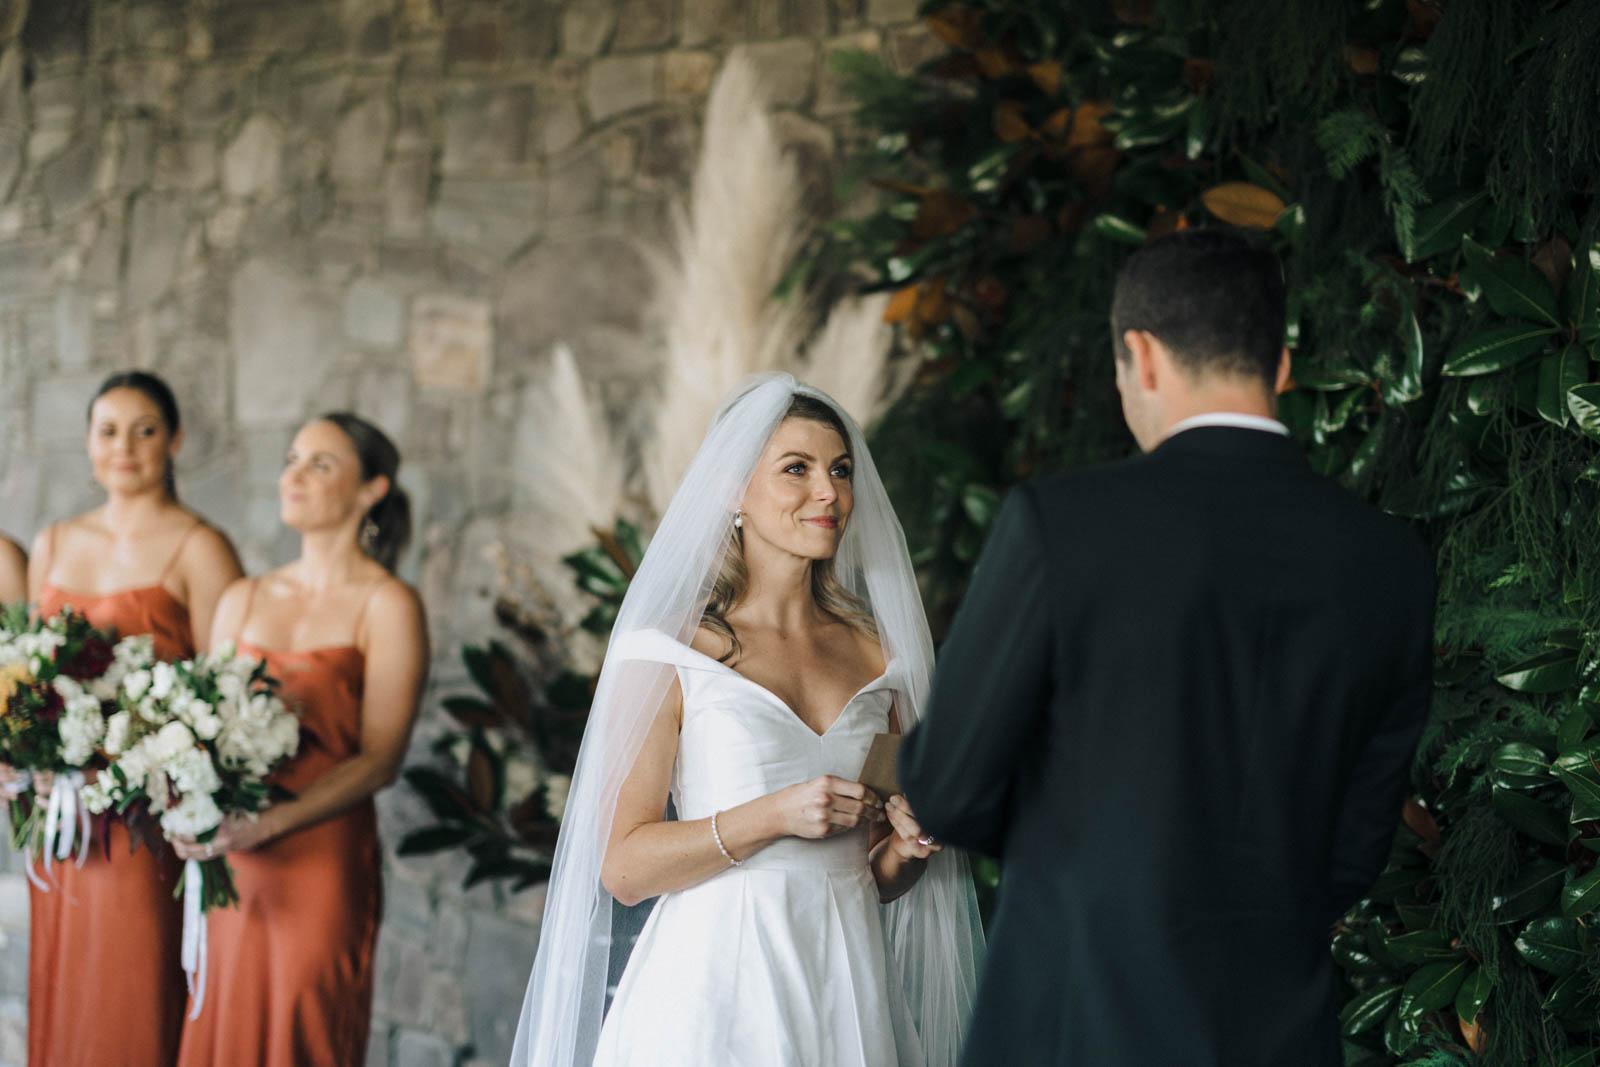 newfound-s-p-mt-maunganui-tauranga-wedding-photographer-1706-A9_06418